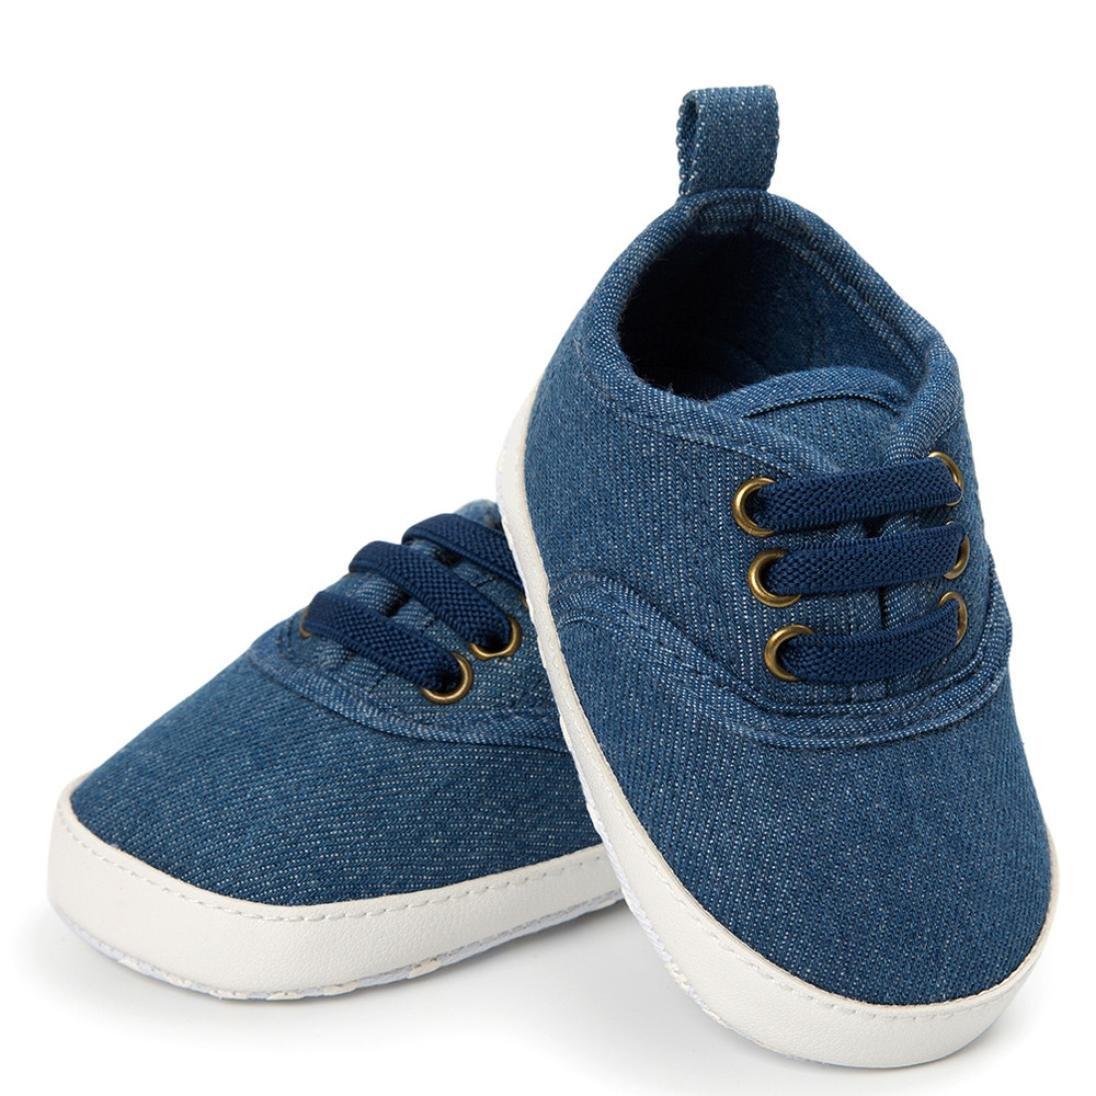 Iuhan Leisure Baby Girl Boys Frenulum Canvas Sneaker Soft Sole Crib Anti-slip Shoes